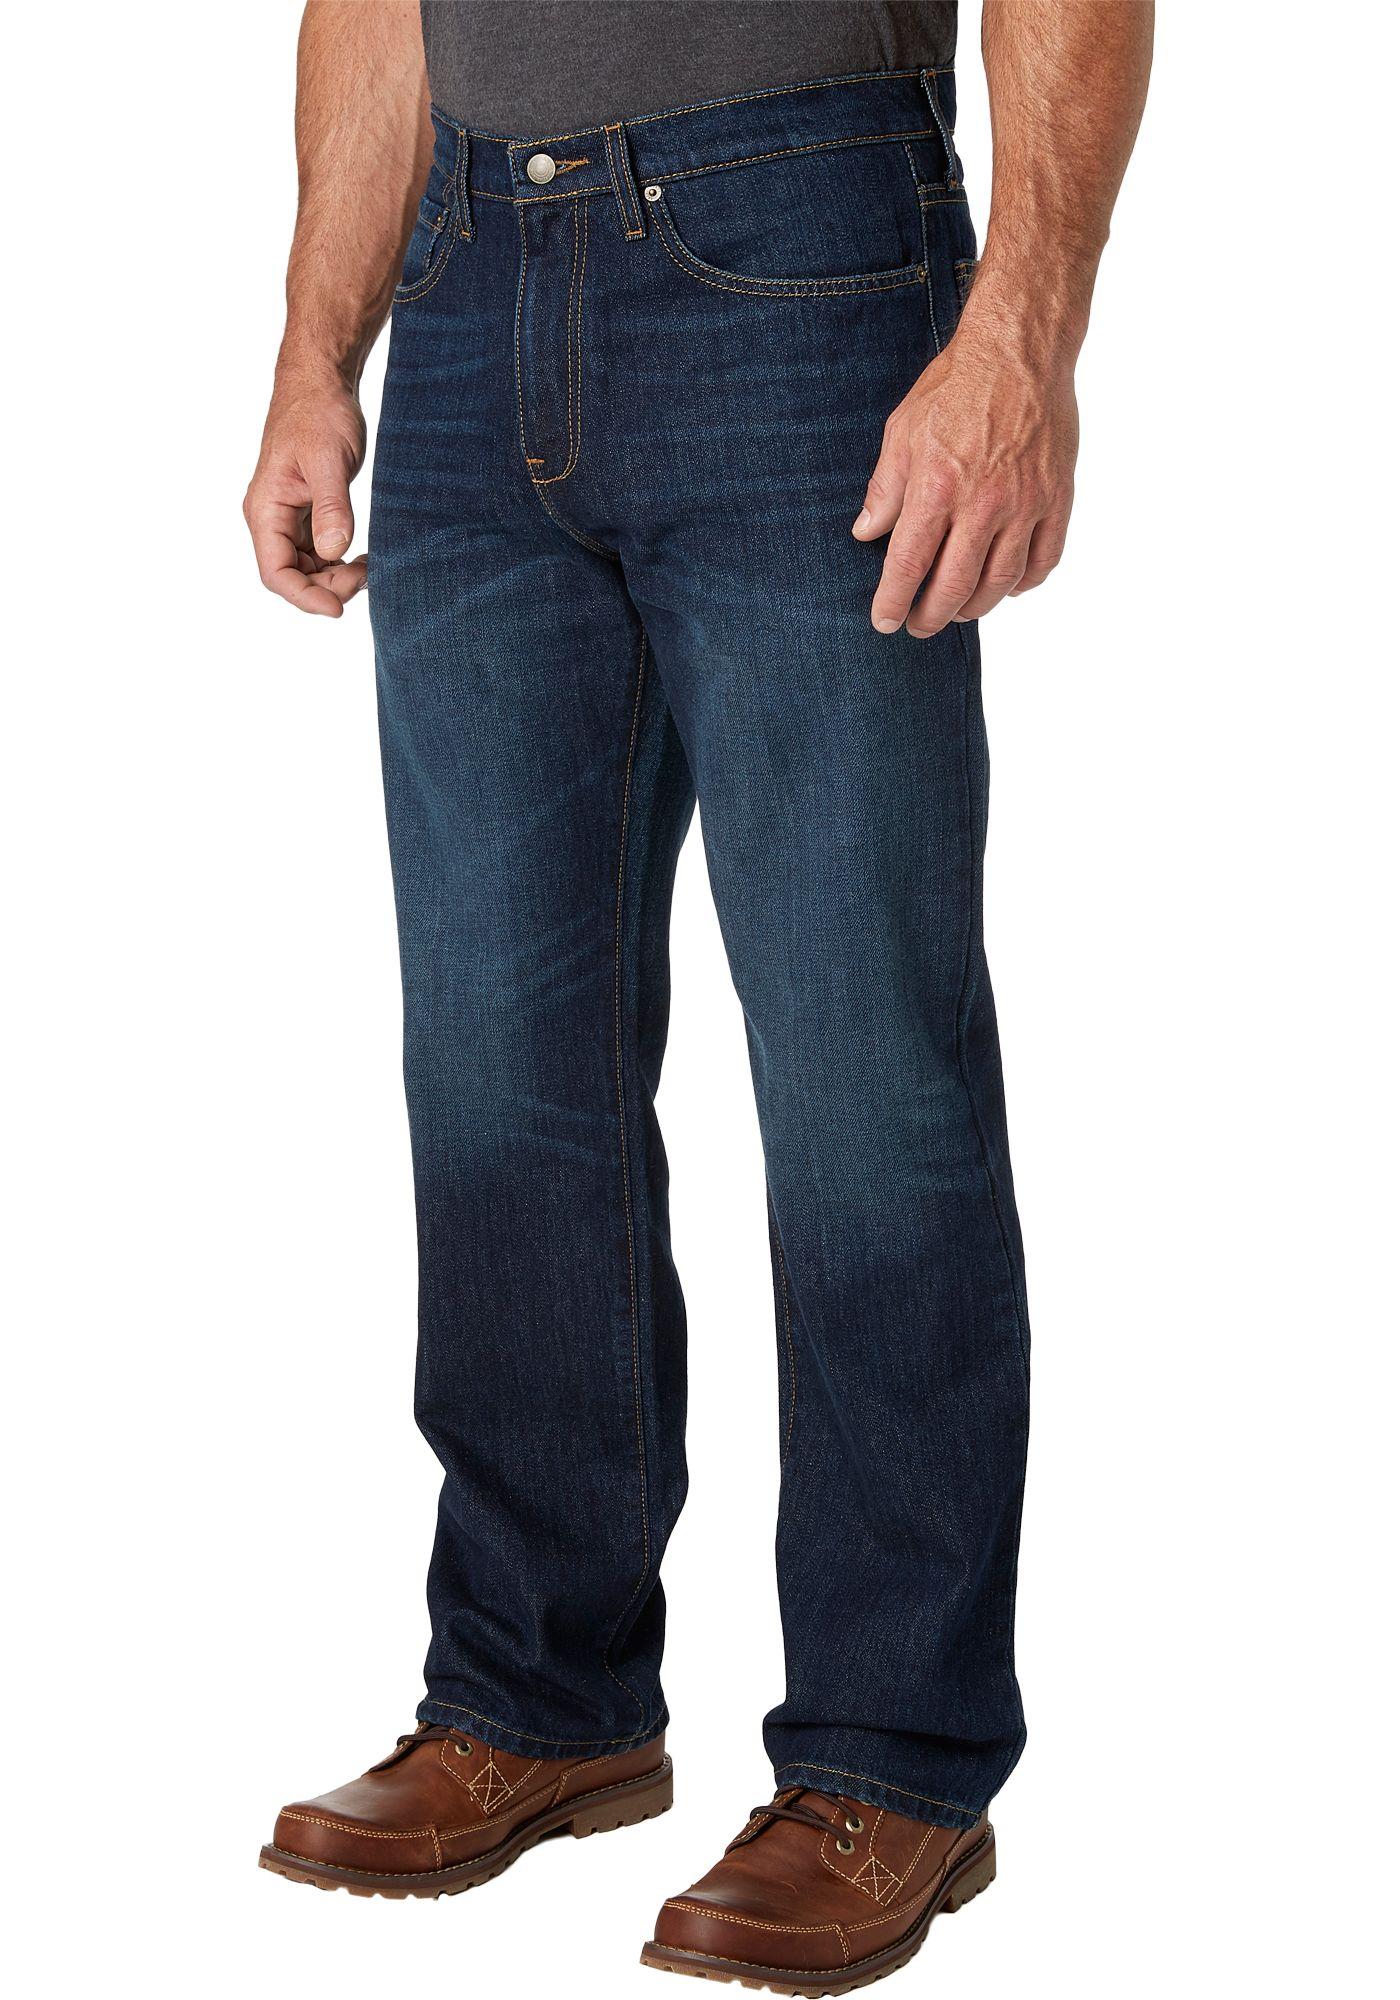 Field & Stream Men's Relaxed Denim Jeans